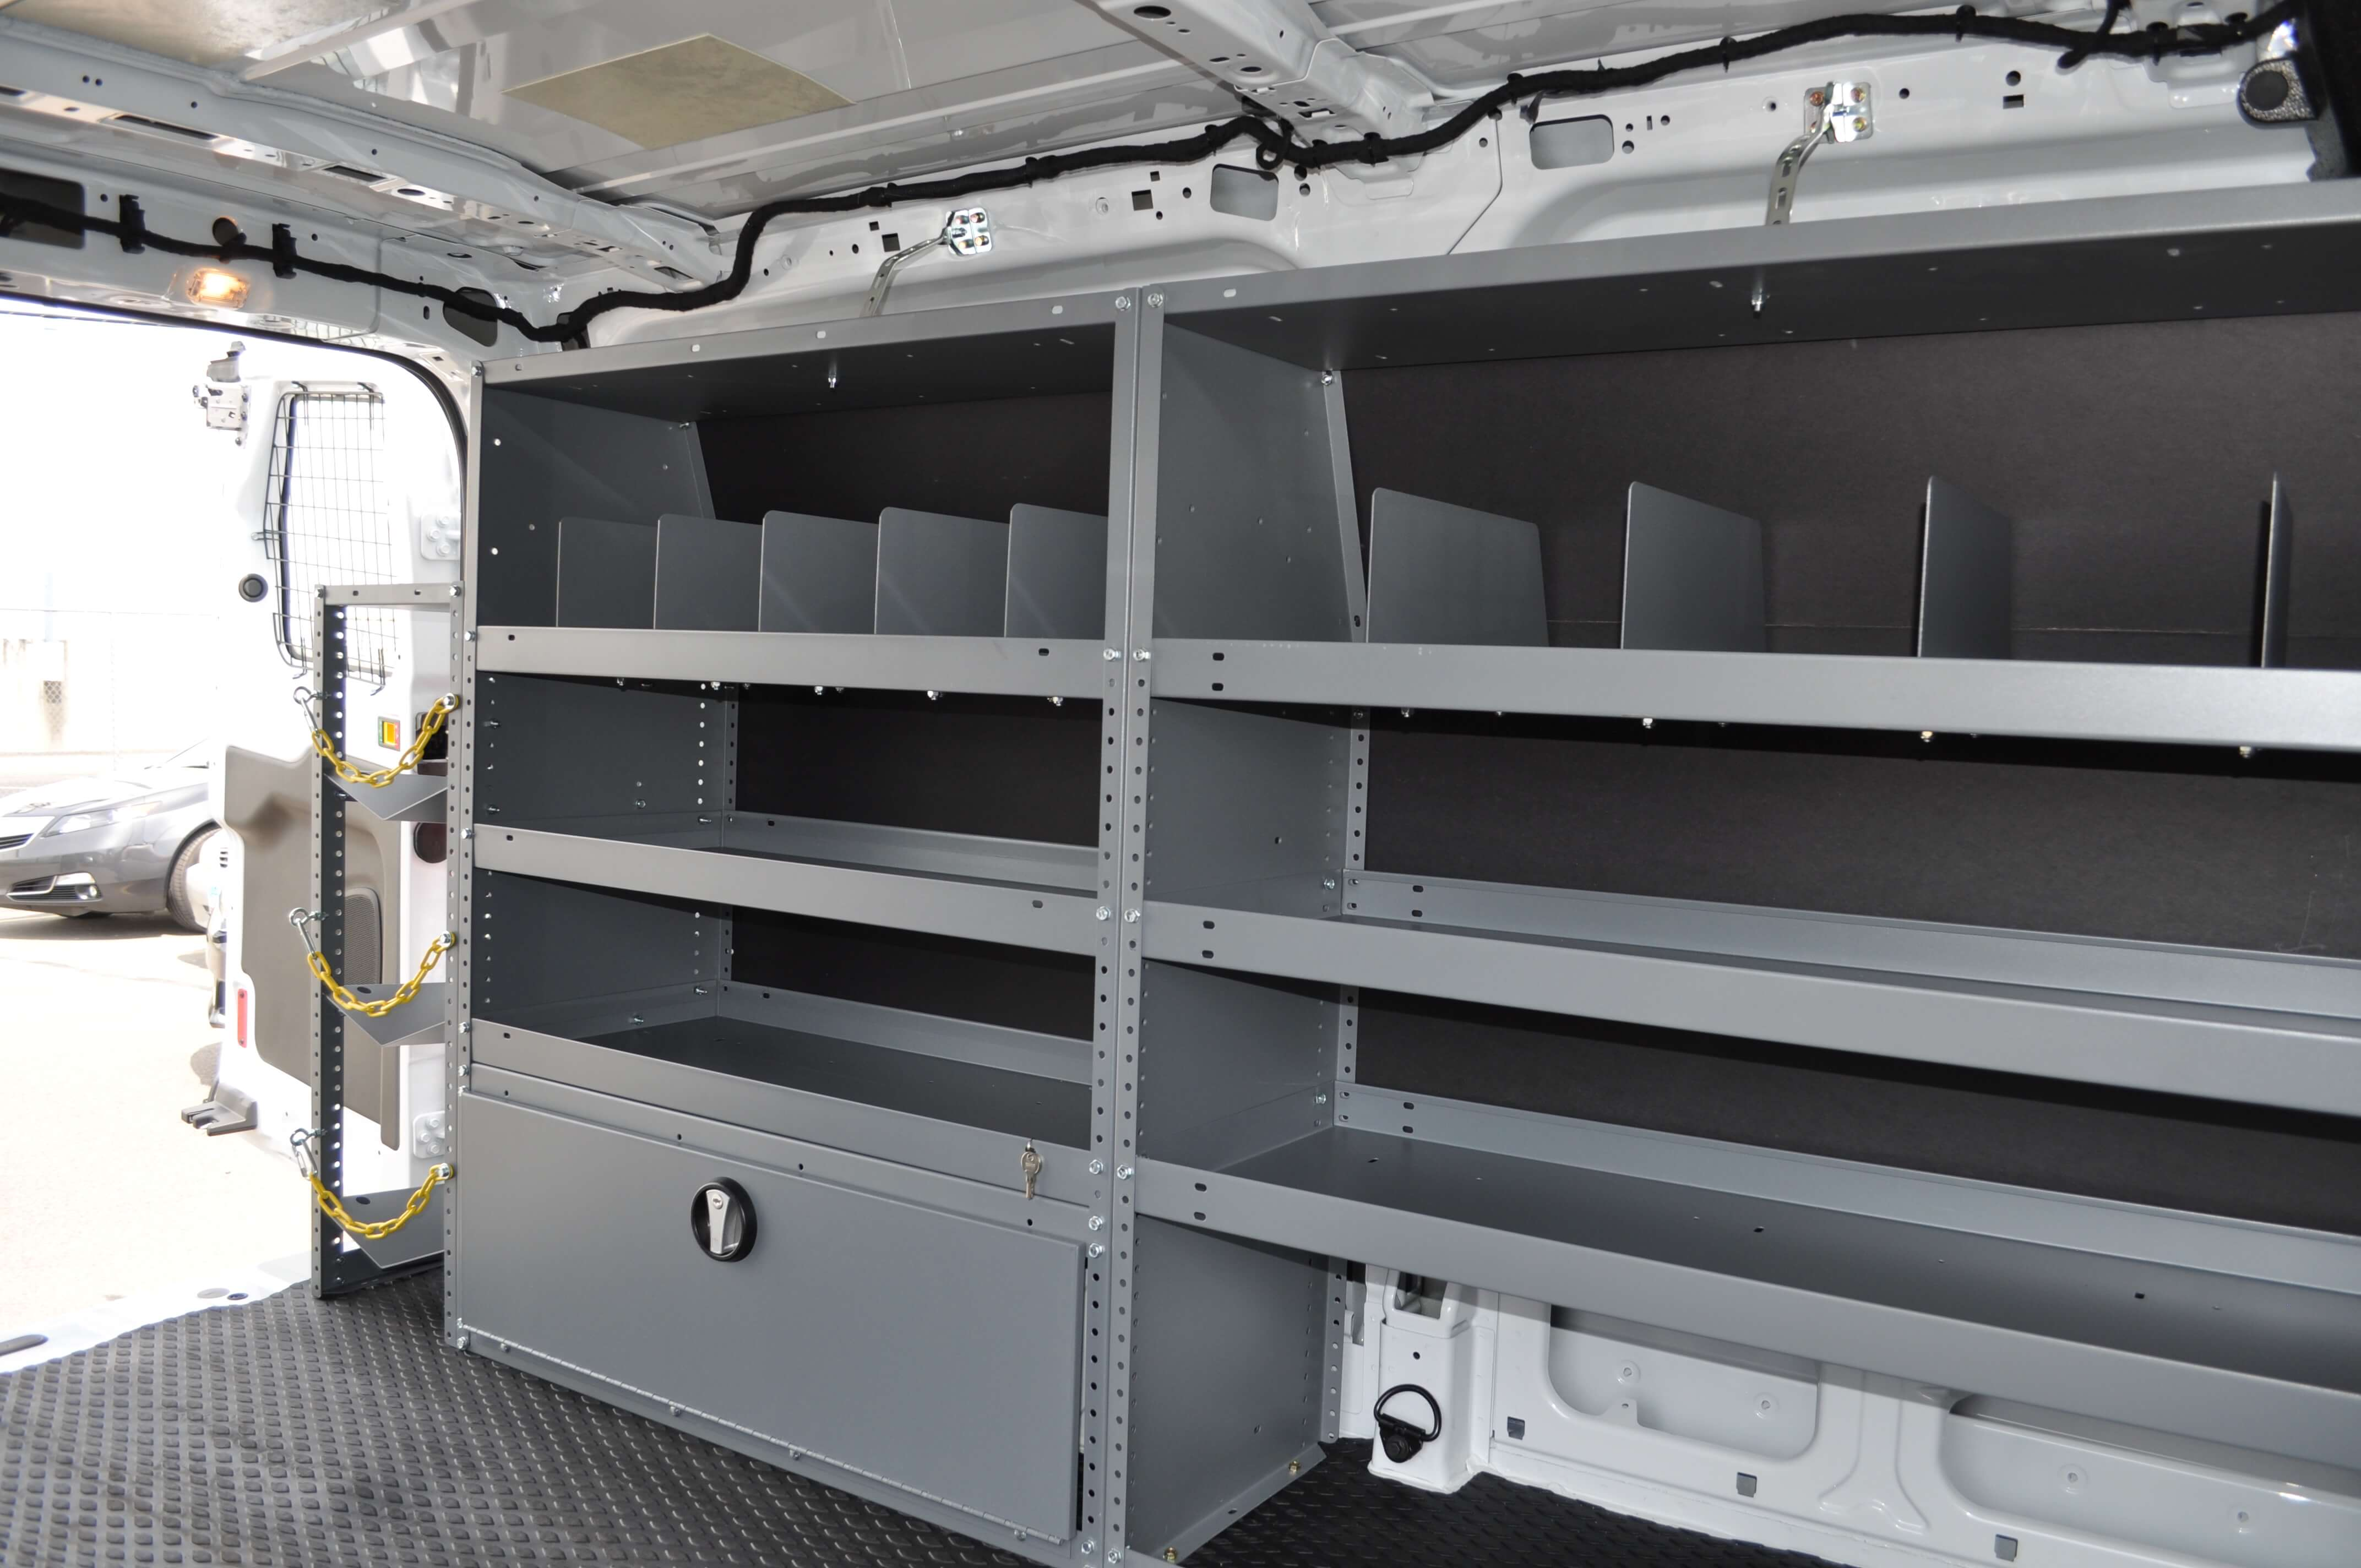 Work Van Shelving And Storage Mike